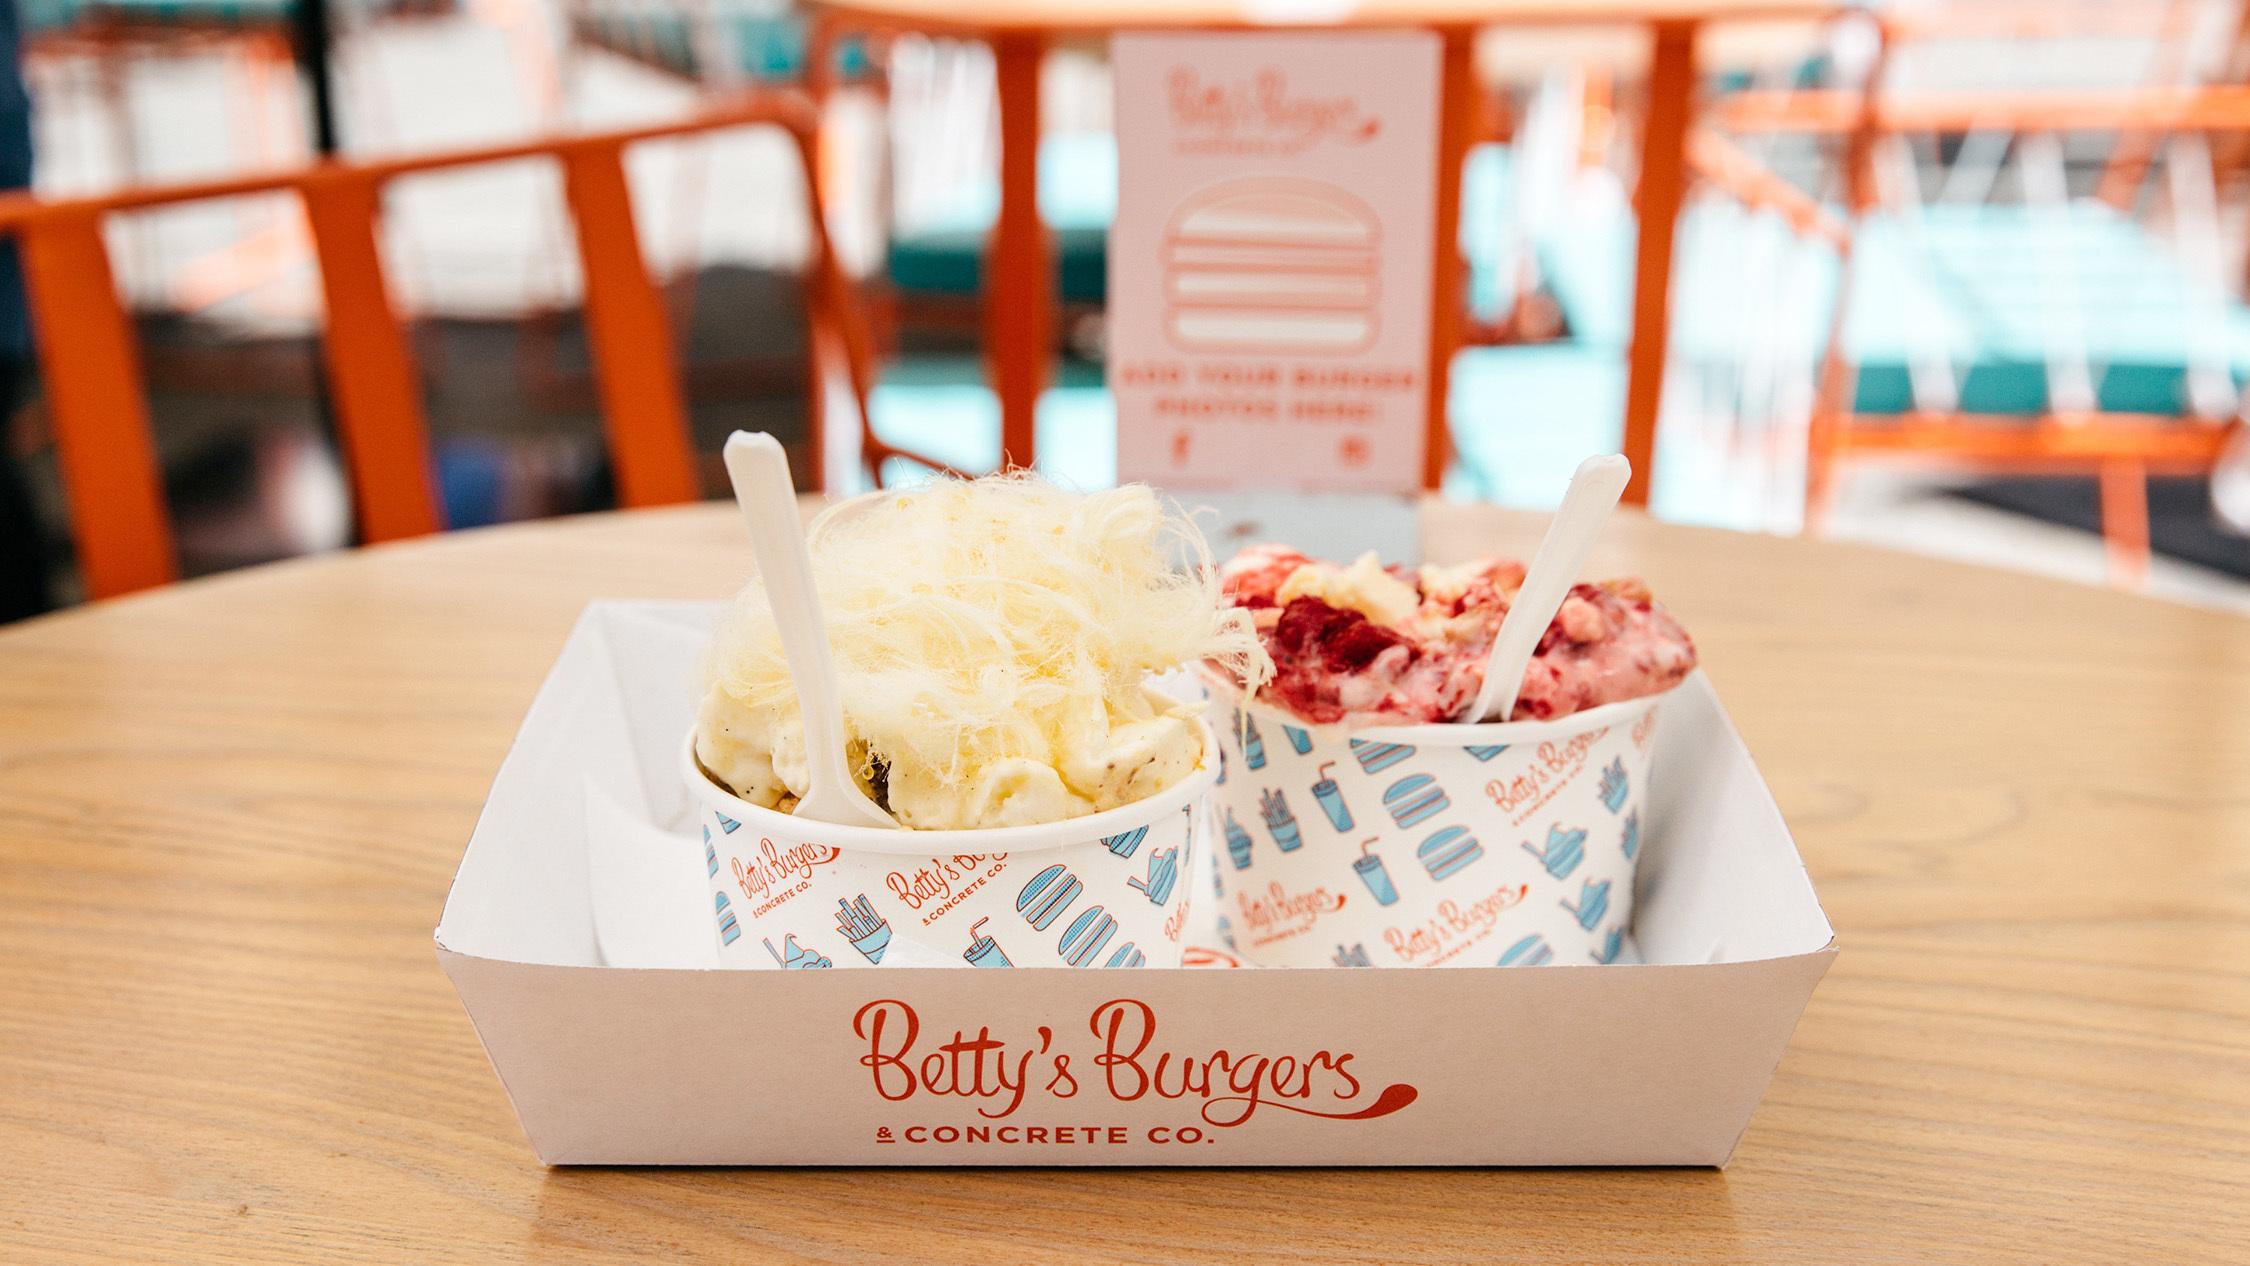 Brisbane's favourite local fast food